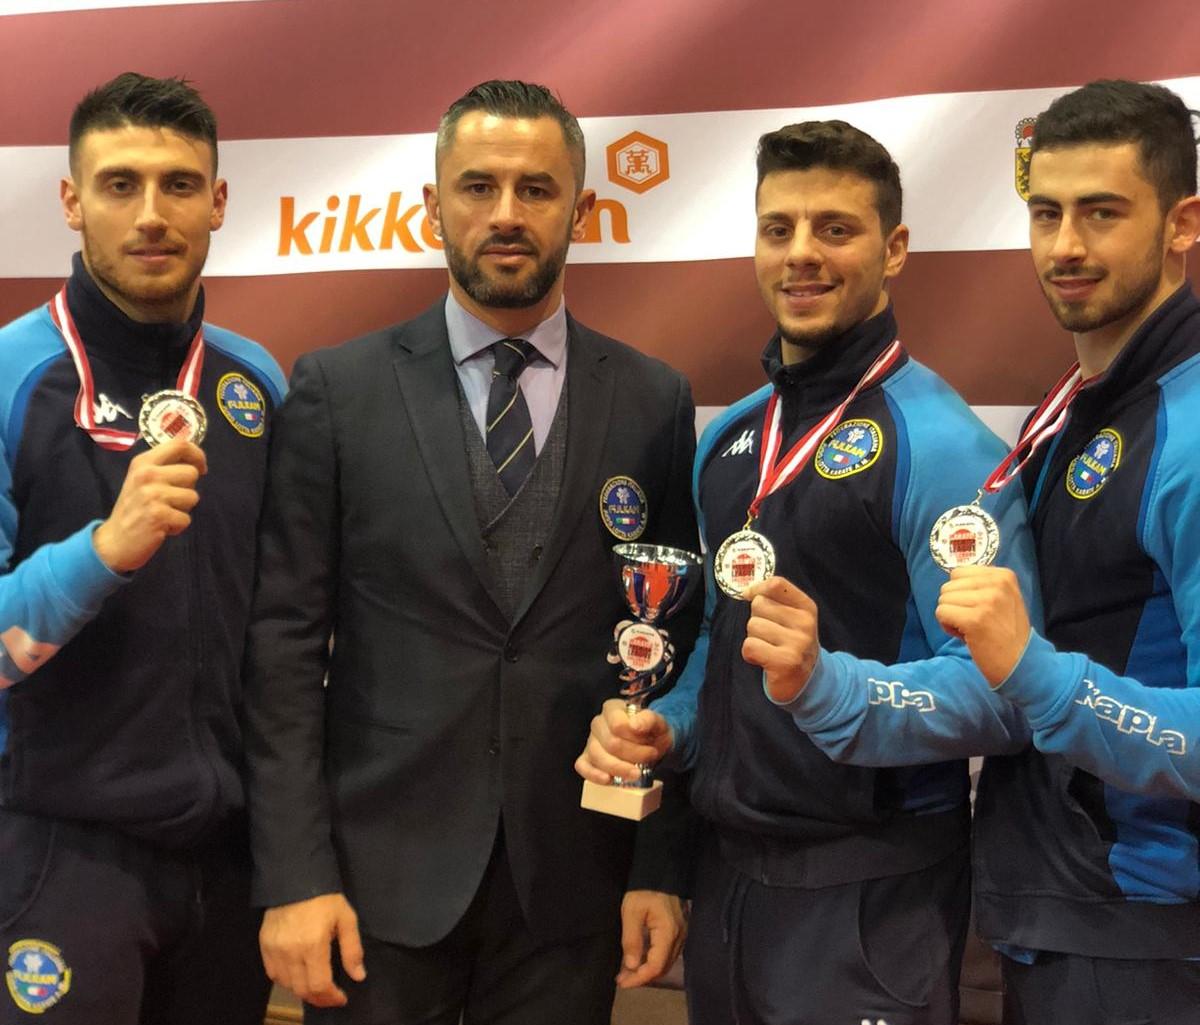 Karate, il vittoriese Giuseppe Panagia argento con la Nazionale italiana a Salisburgo